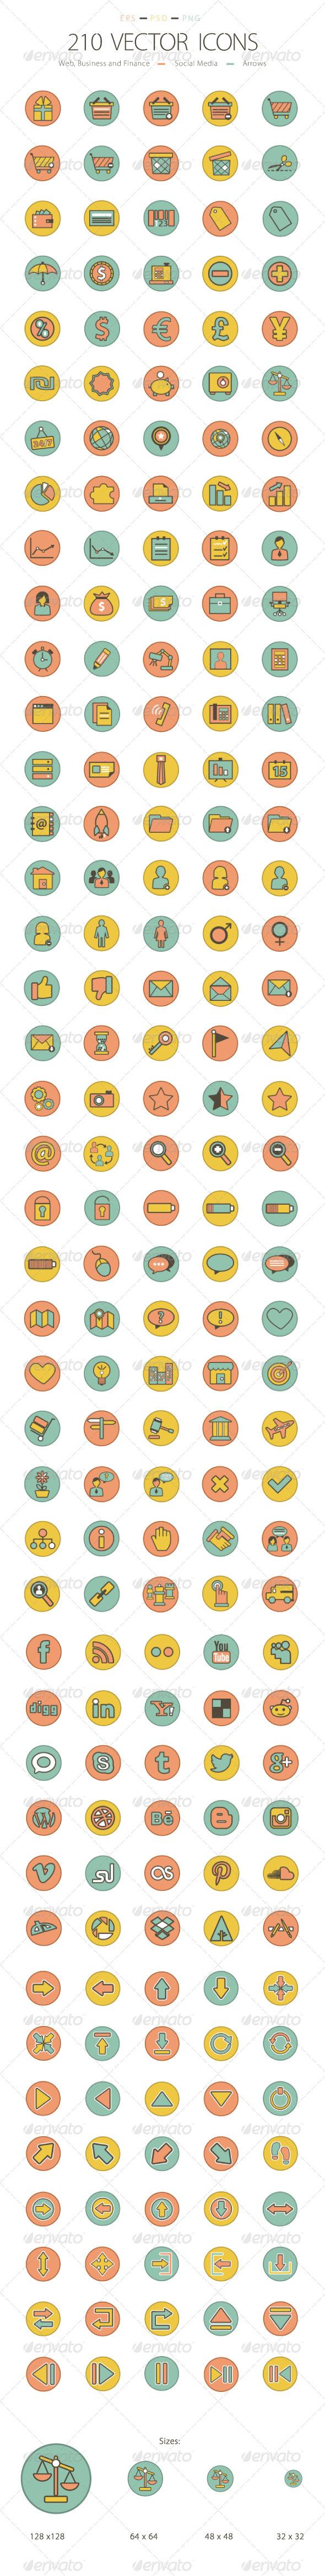 Set of 210 Icons - Web Icons